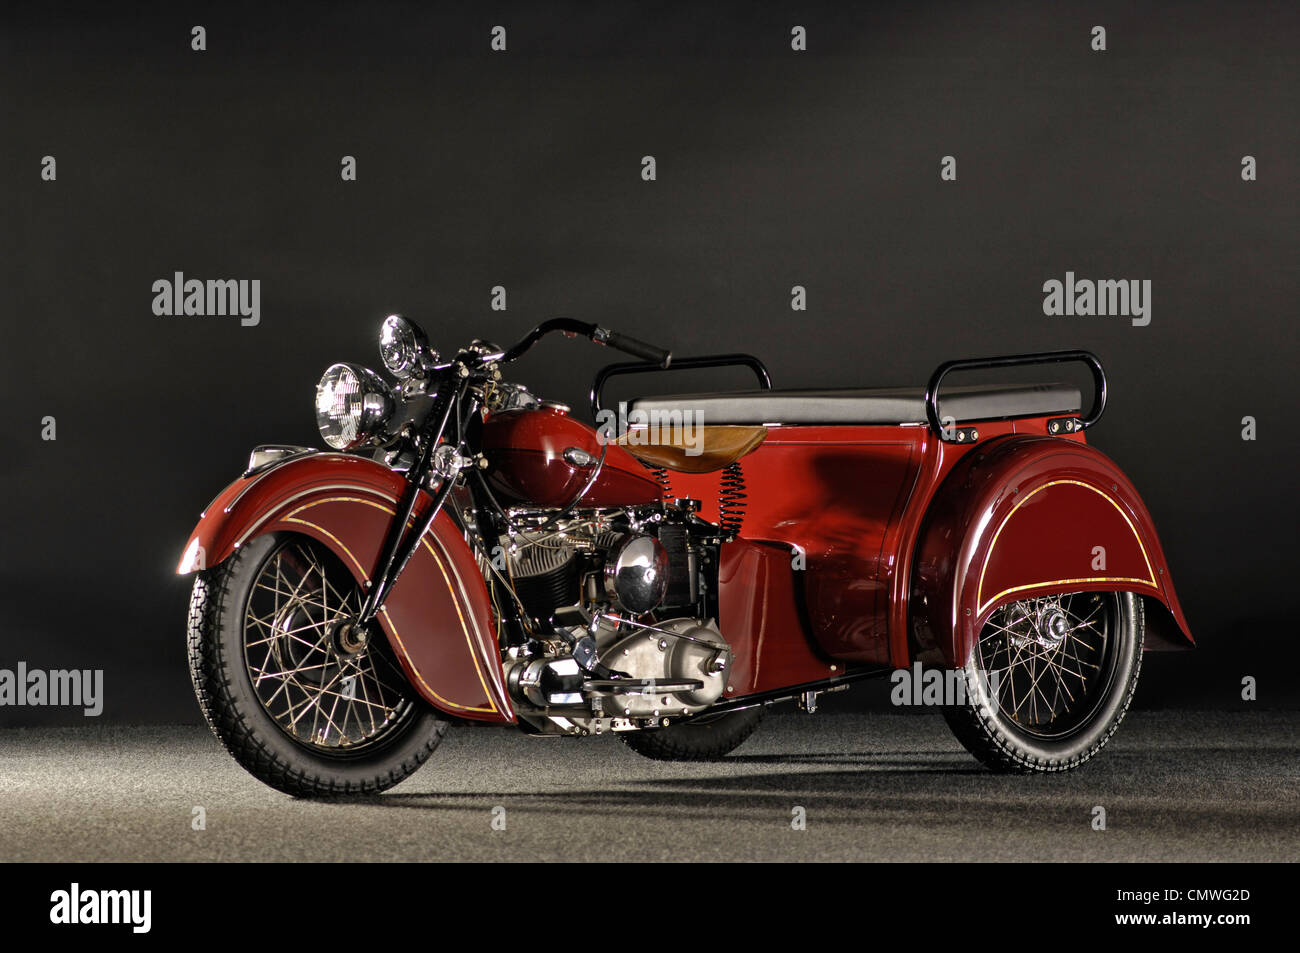 1940 Indian despatch tow 3 wheeler - Stock Image